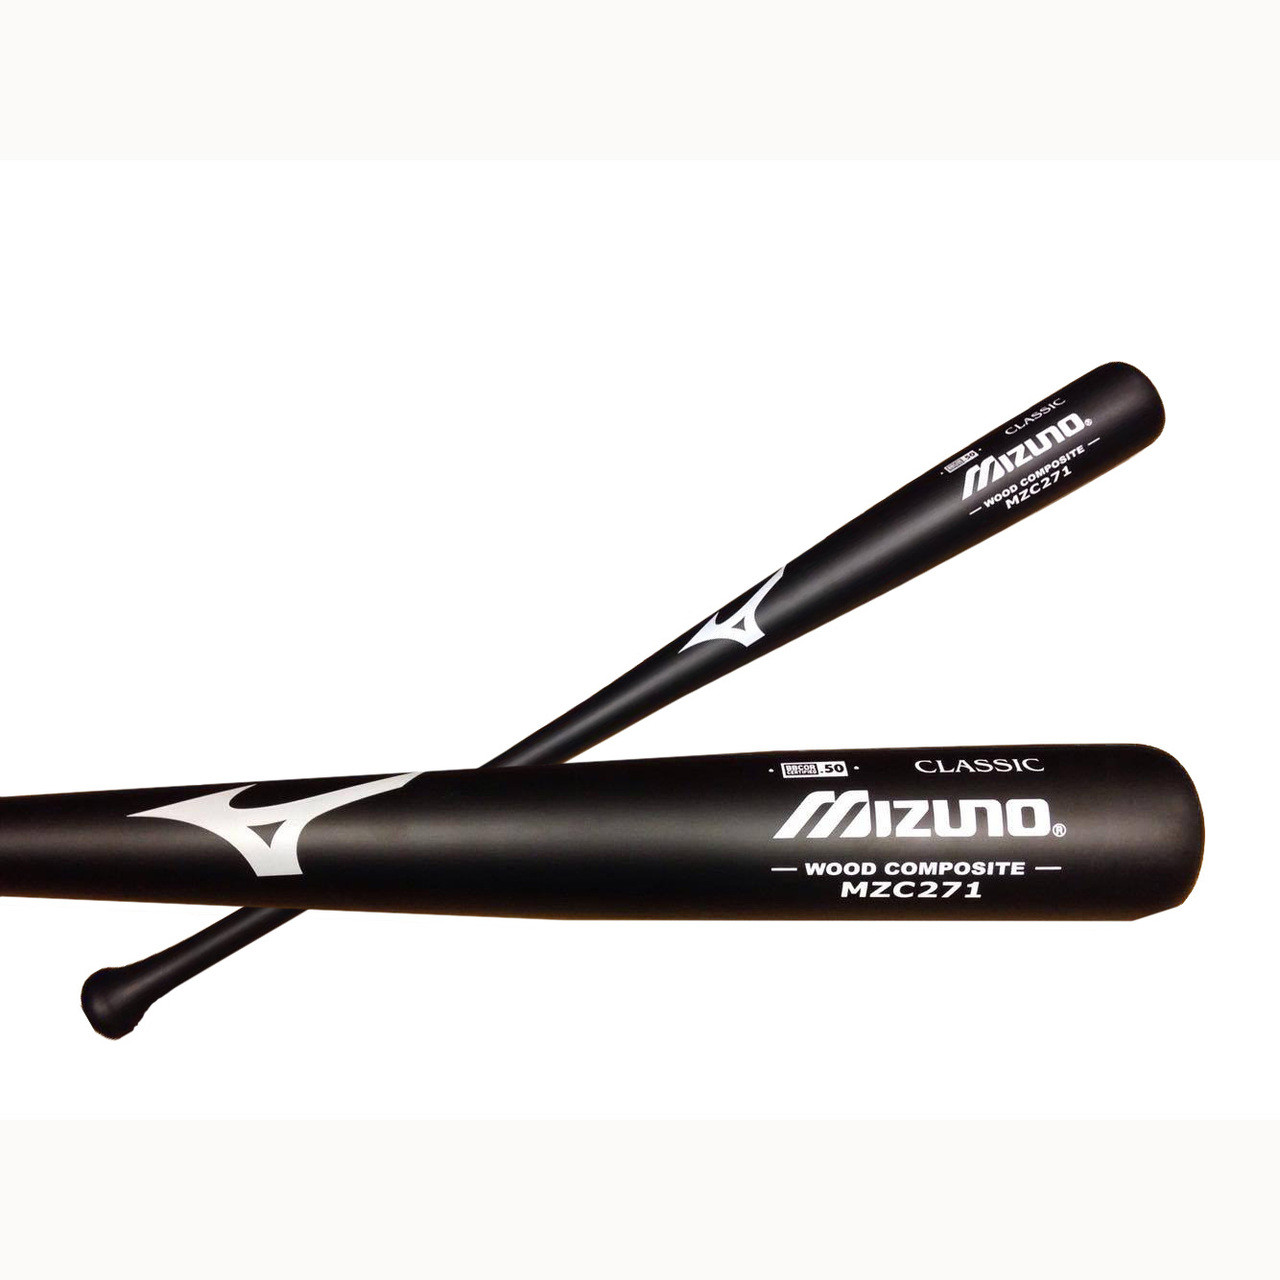 fadbfa9aeda Mizuno Wood Composite MZC 271 Black Baseball Bat - Dynamax Sports